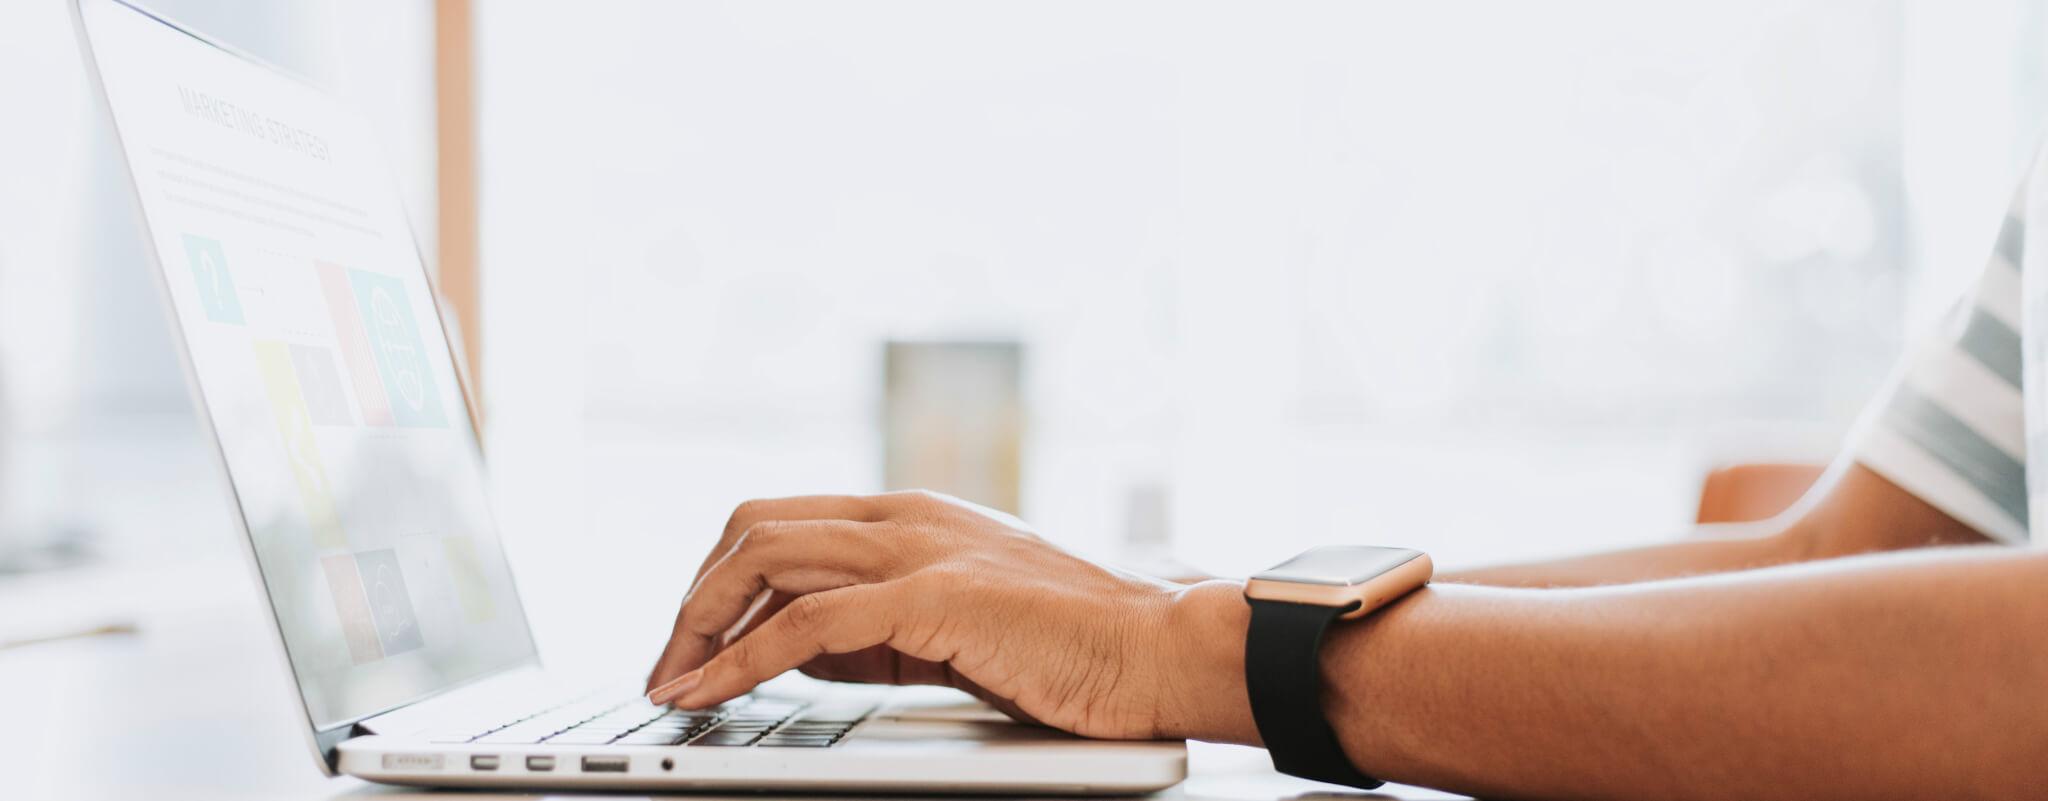 Comapring service desk vs help desk